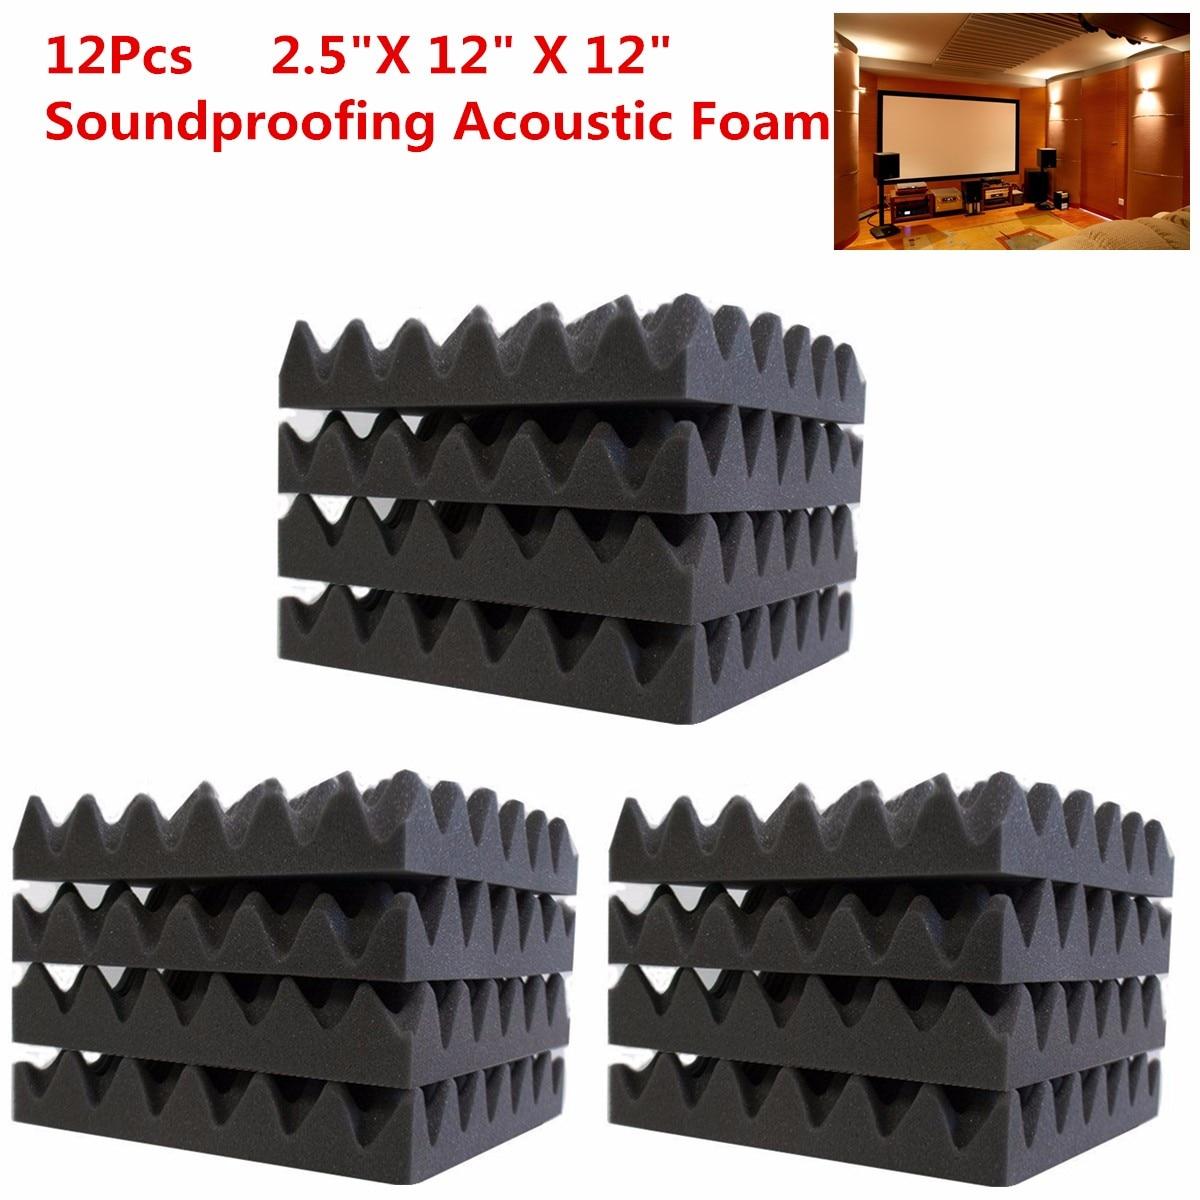 12Pcs 30*30*6cm Soundproofing Foam Acoustic Foam Sound Treatment Studio Room Absorption Wedge Tiles sound absorption coefficient analysis